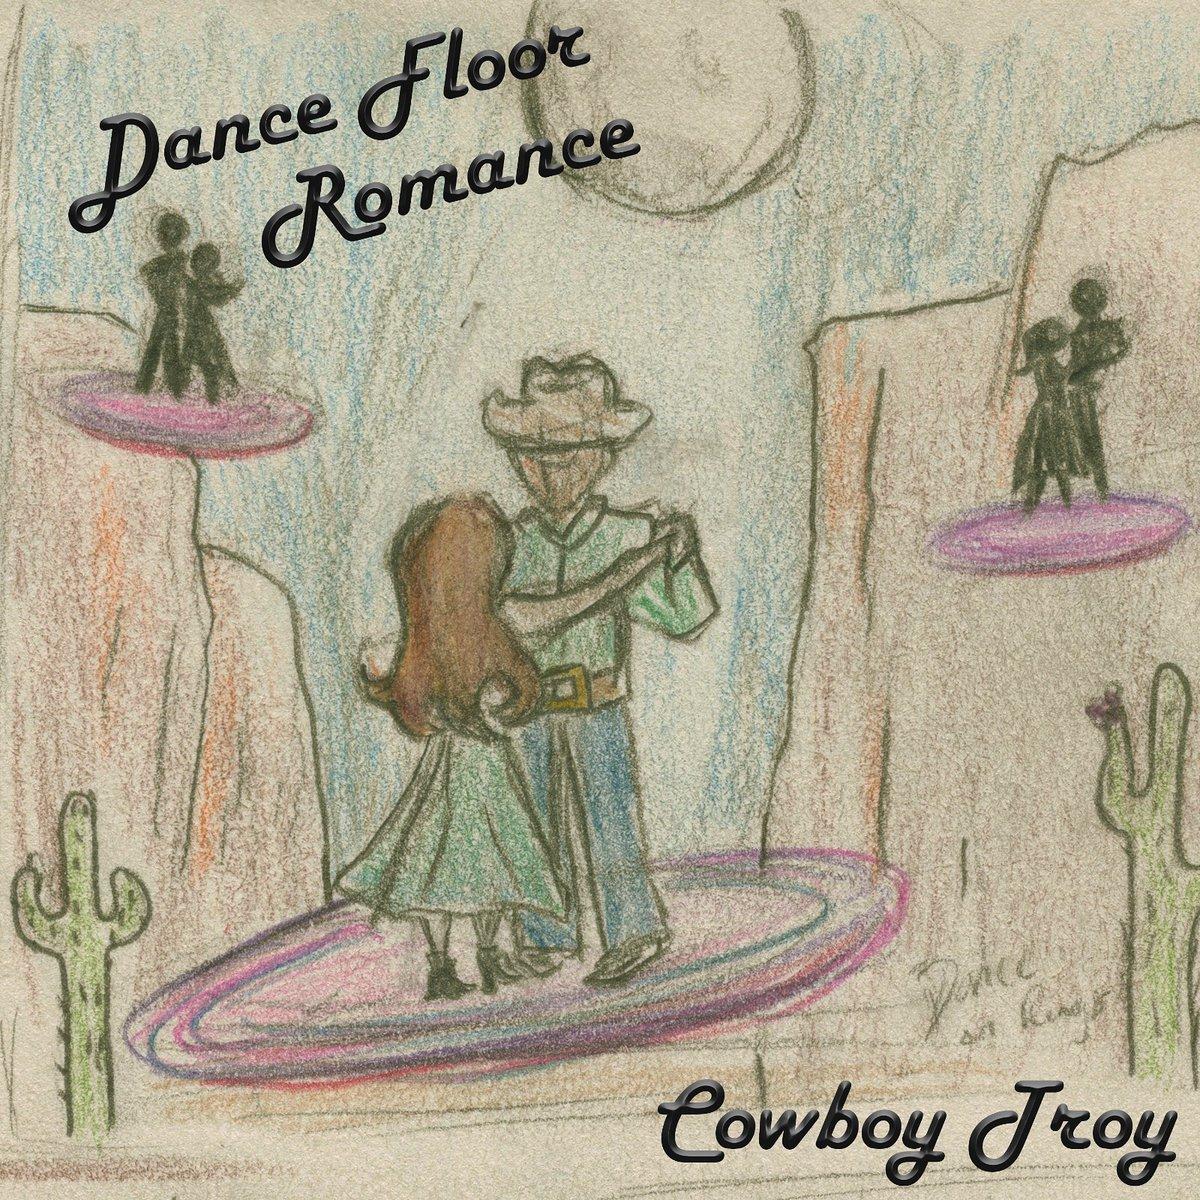 #NowStreaming #DanceFloorRomance